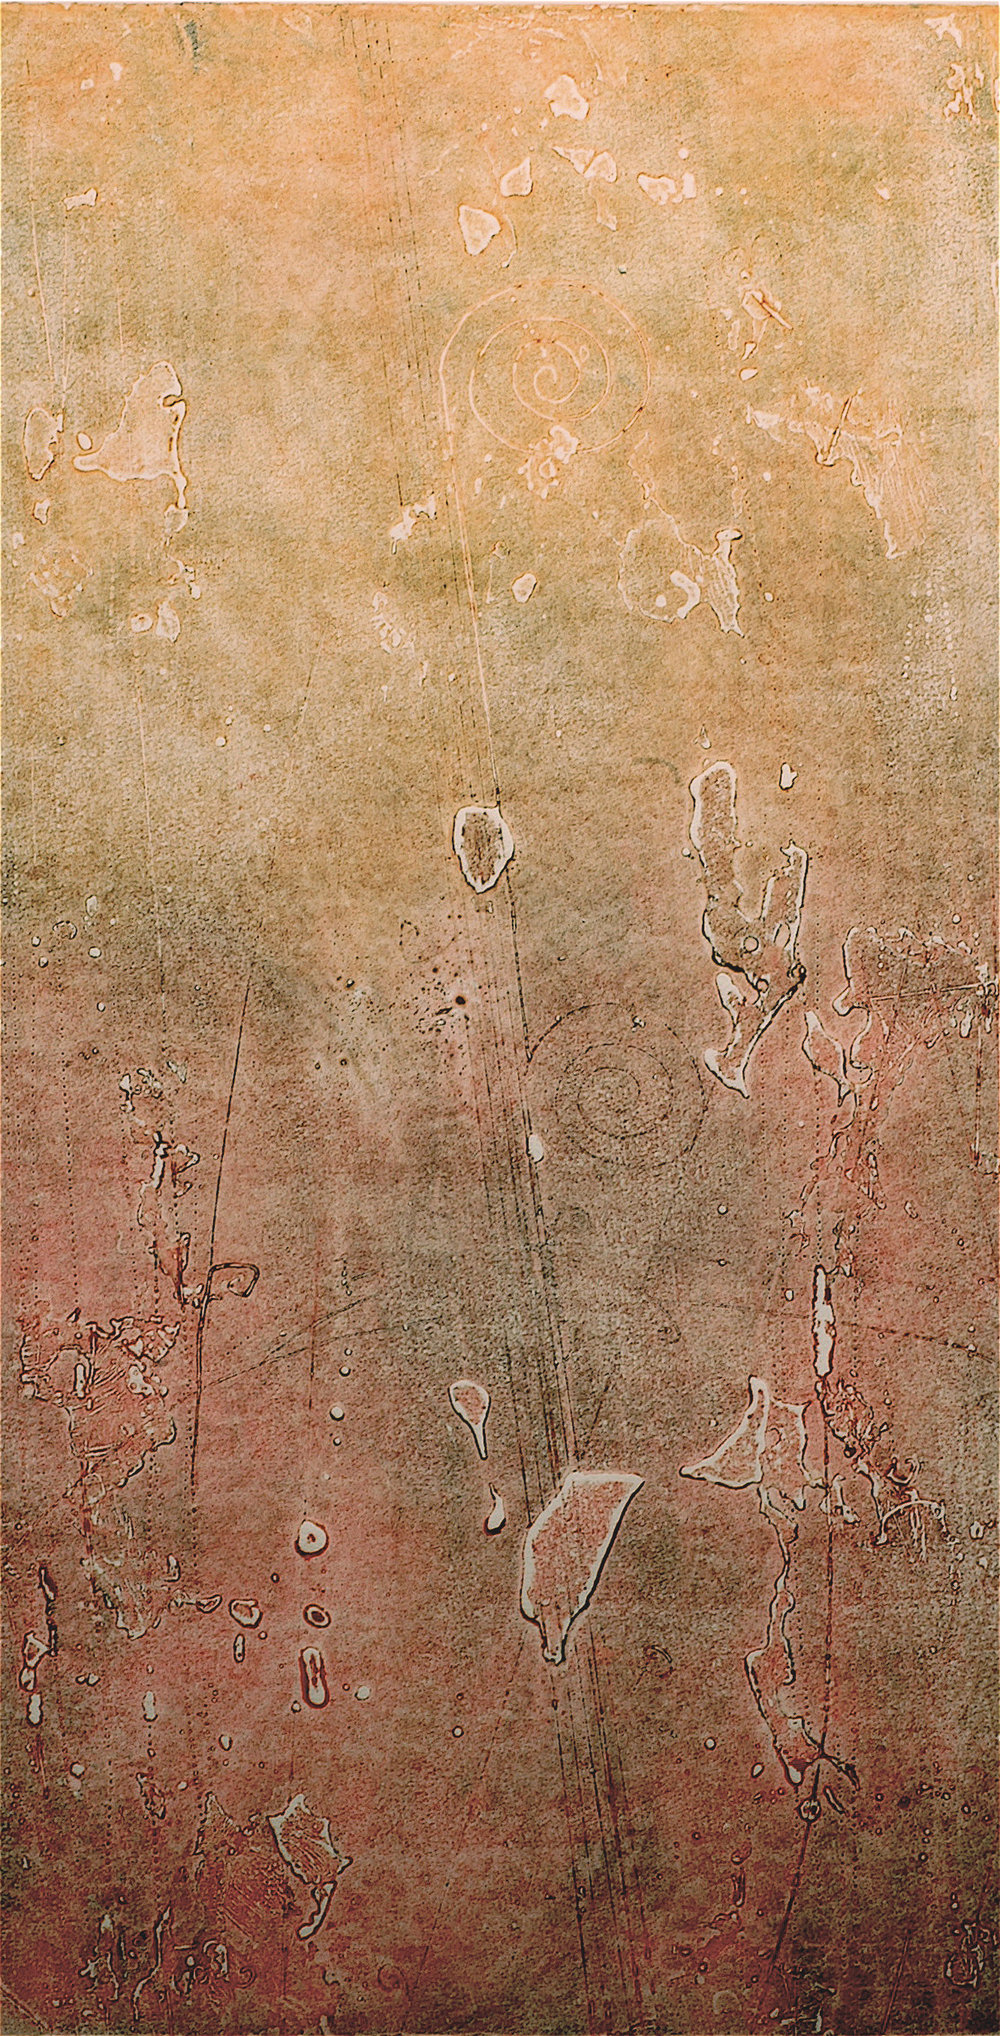 Hadron Print 3 , encaustic collagraph monoprint on paper 24 x 12 inches.  Studio Inventory